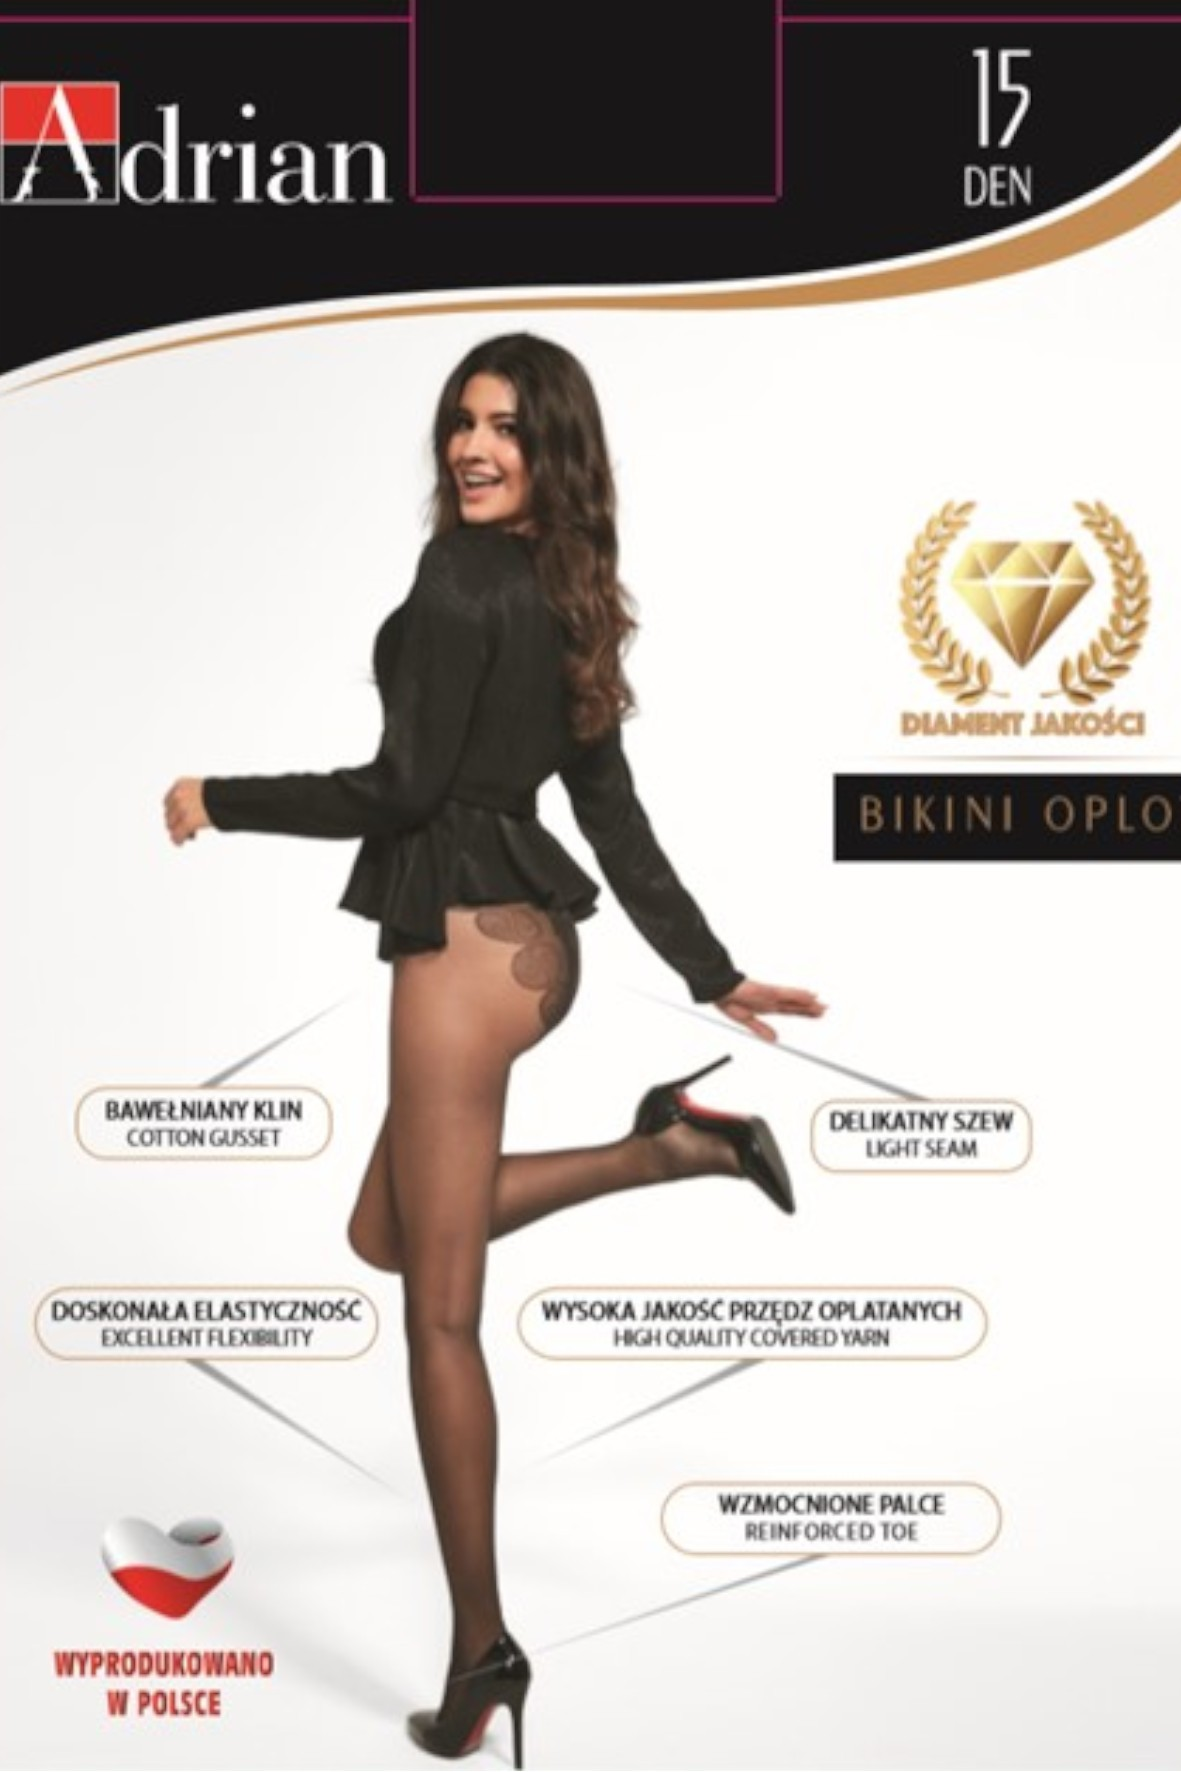 Rajstopy damskie Bikini  20 DEN - beżowe